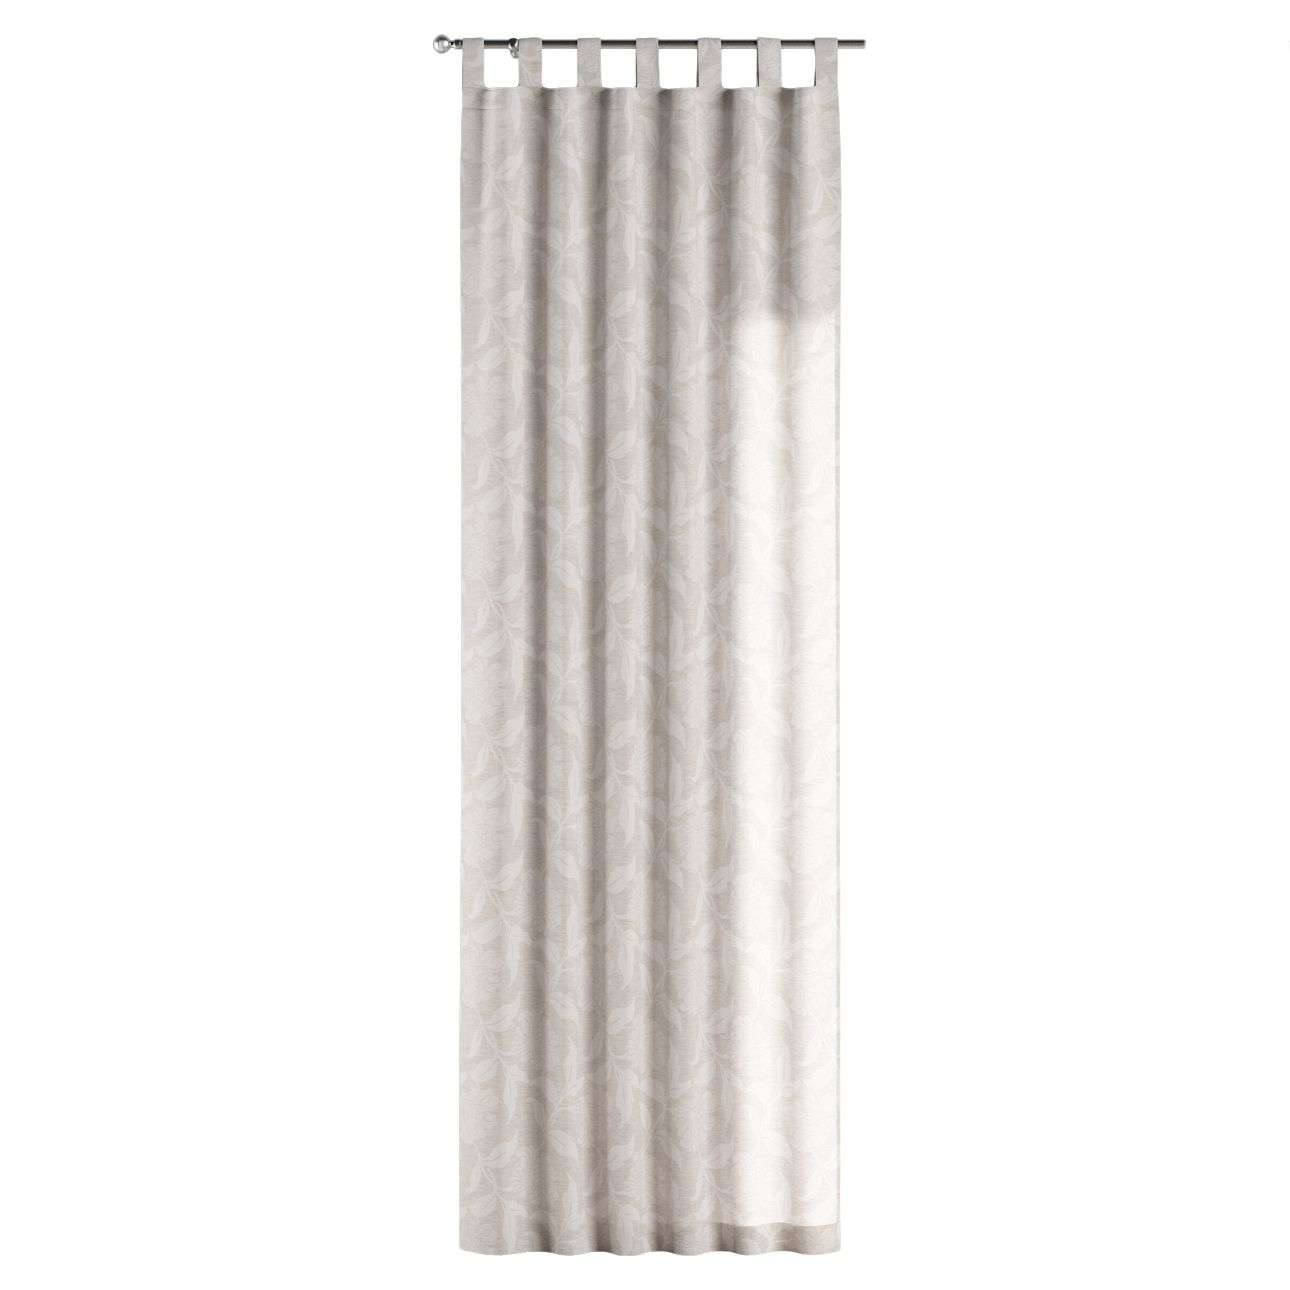 Gardin med stropper 1 stk. fra kollektionen Venice, Stof: 140-51